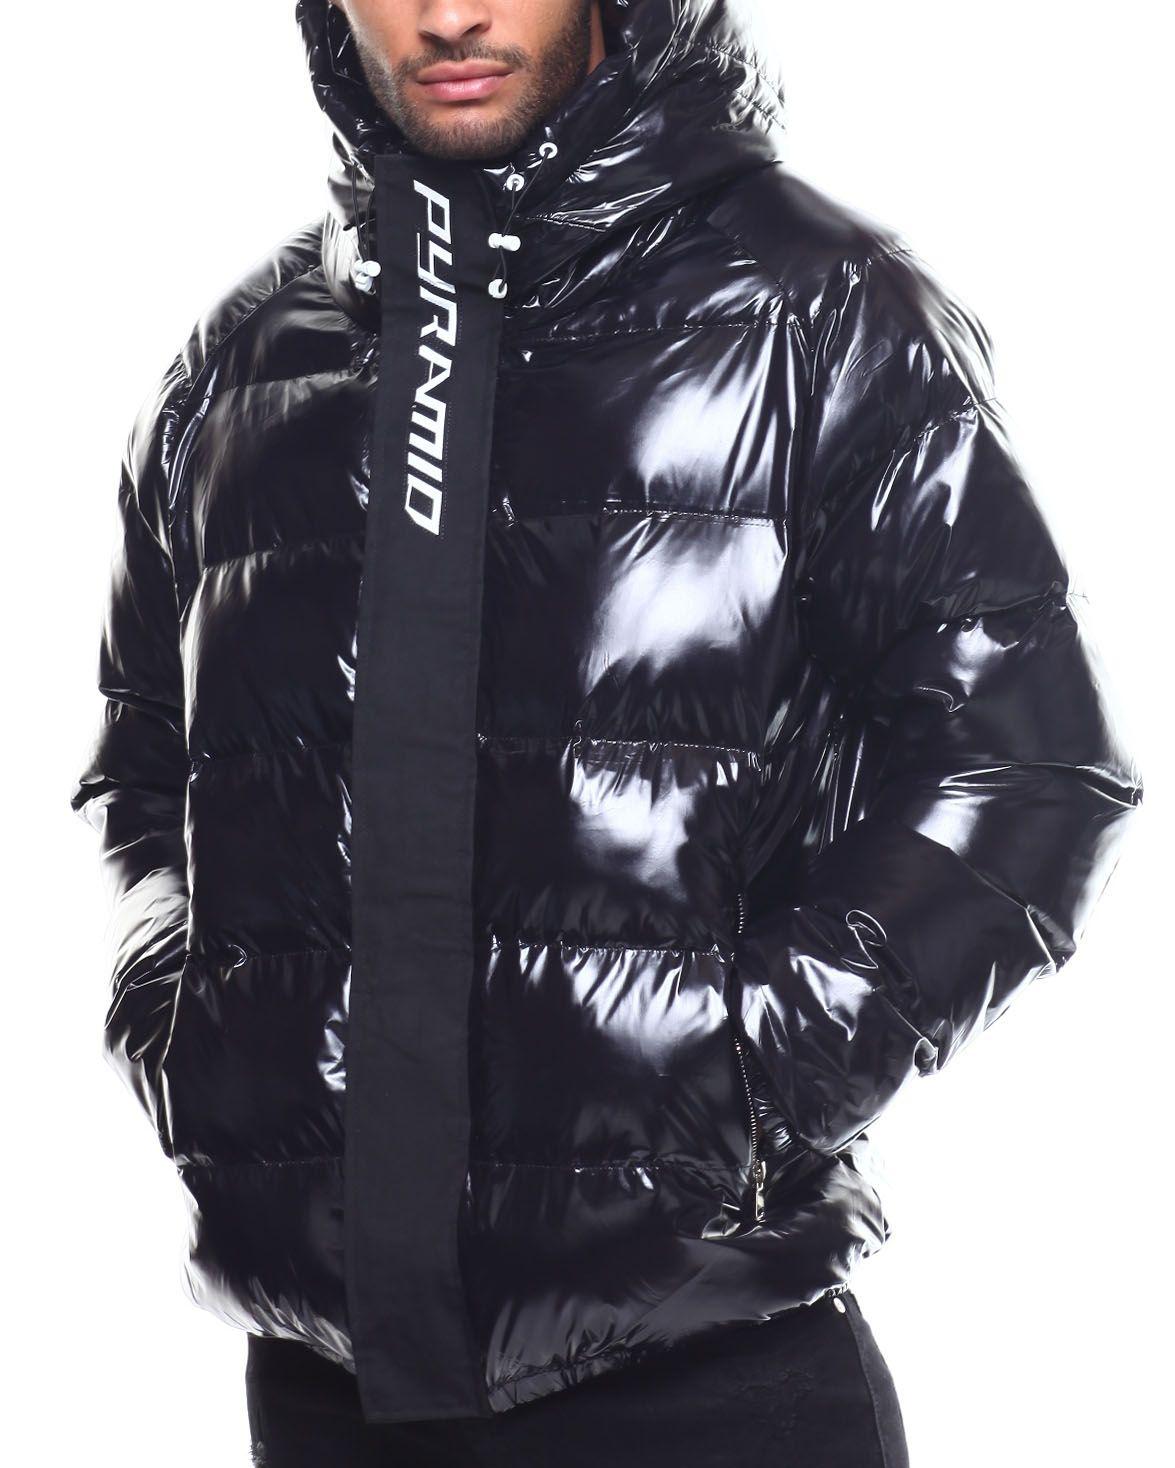 Bp Full Zip Taped Placket Jacket From Black Pyramid At Drjays Com Captain America Leather Jacket Shiny Jacket Mens Gym Fashion [ 1468 x 1175 Pixel ]